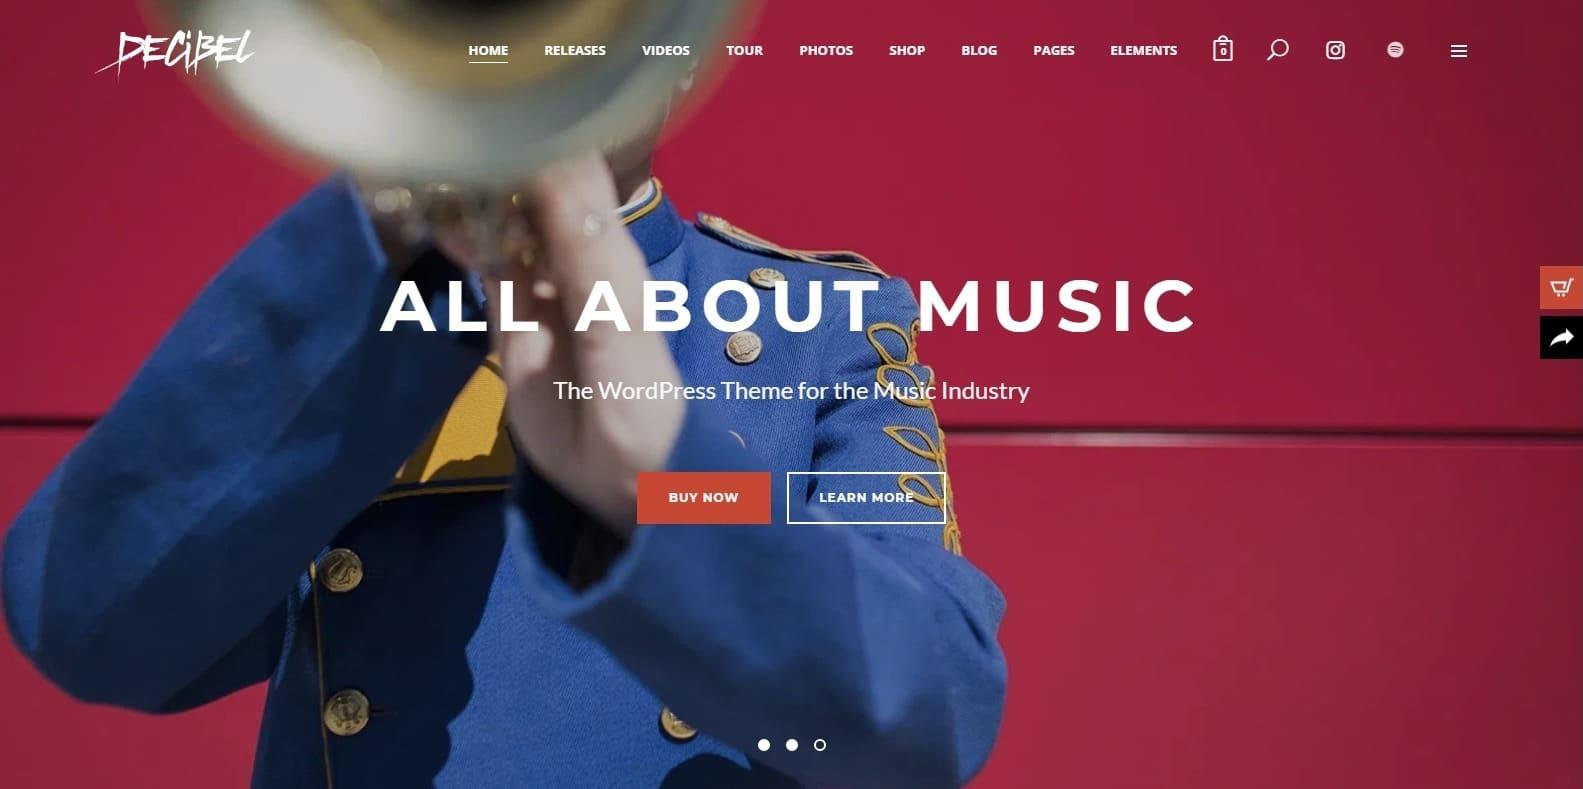 decibel-recording-studio-website-template